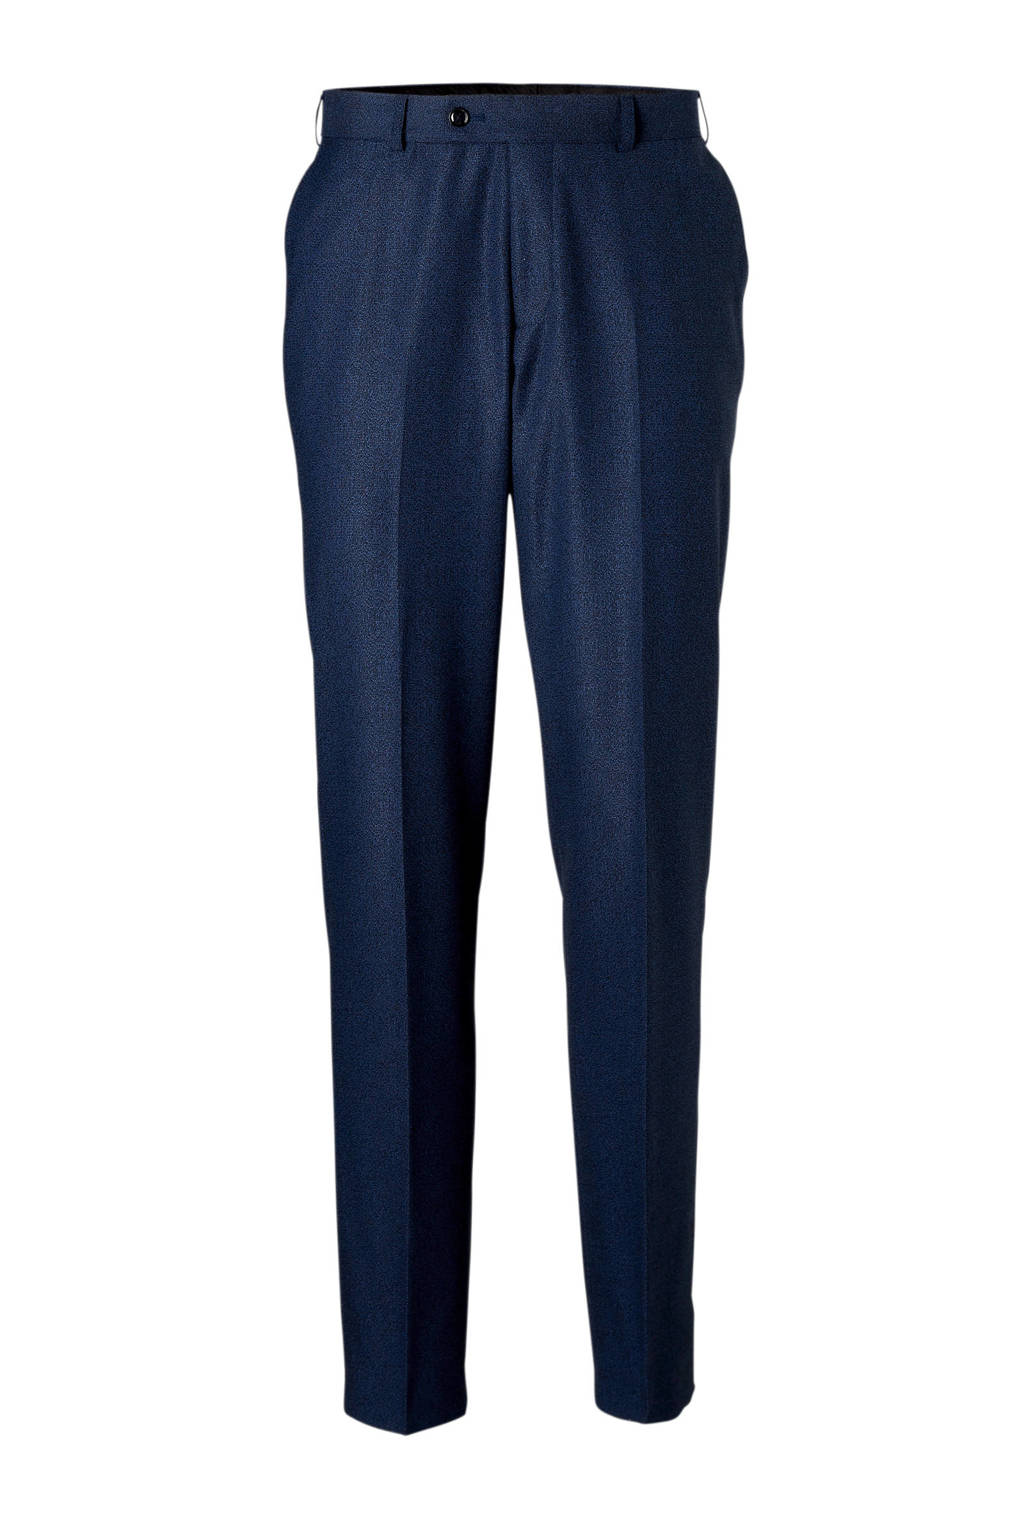 C&A Angelo Litrico slim fit pantalon met print donkerblauw, Donkerblauw/zwart